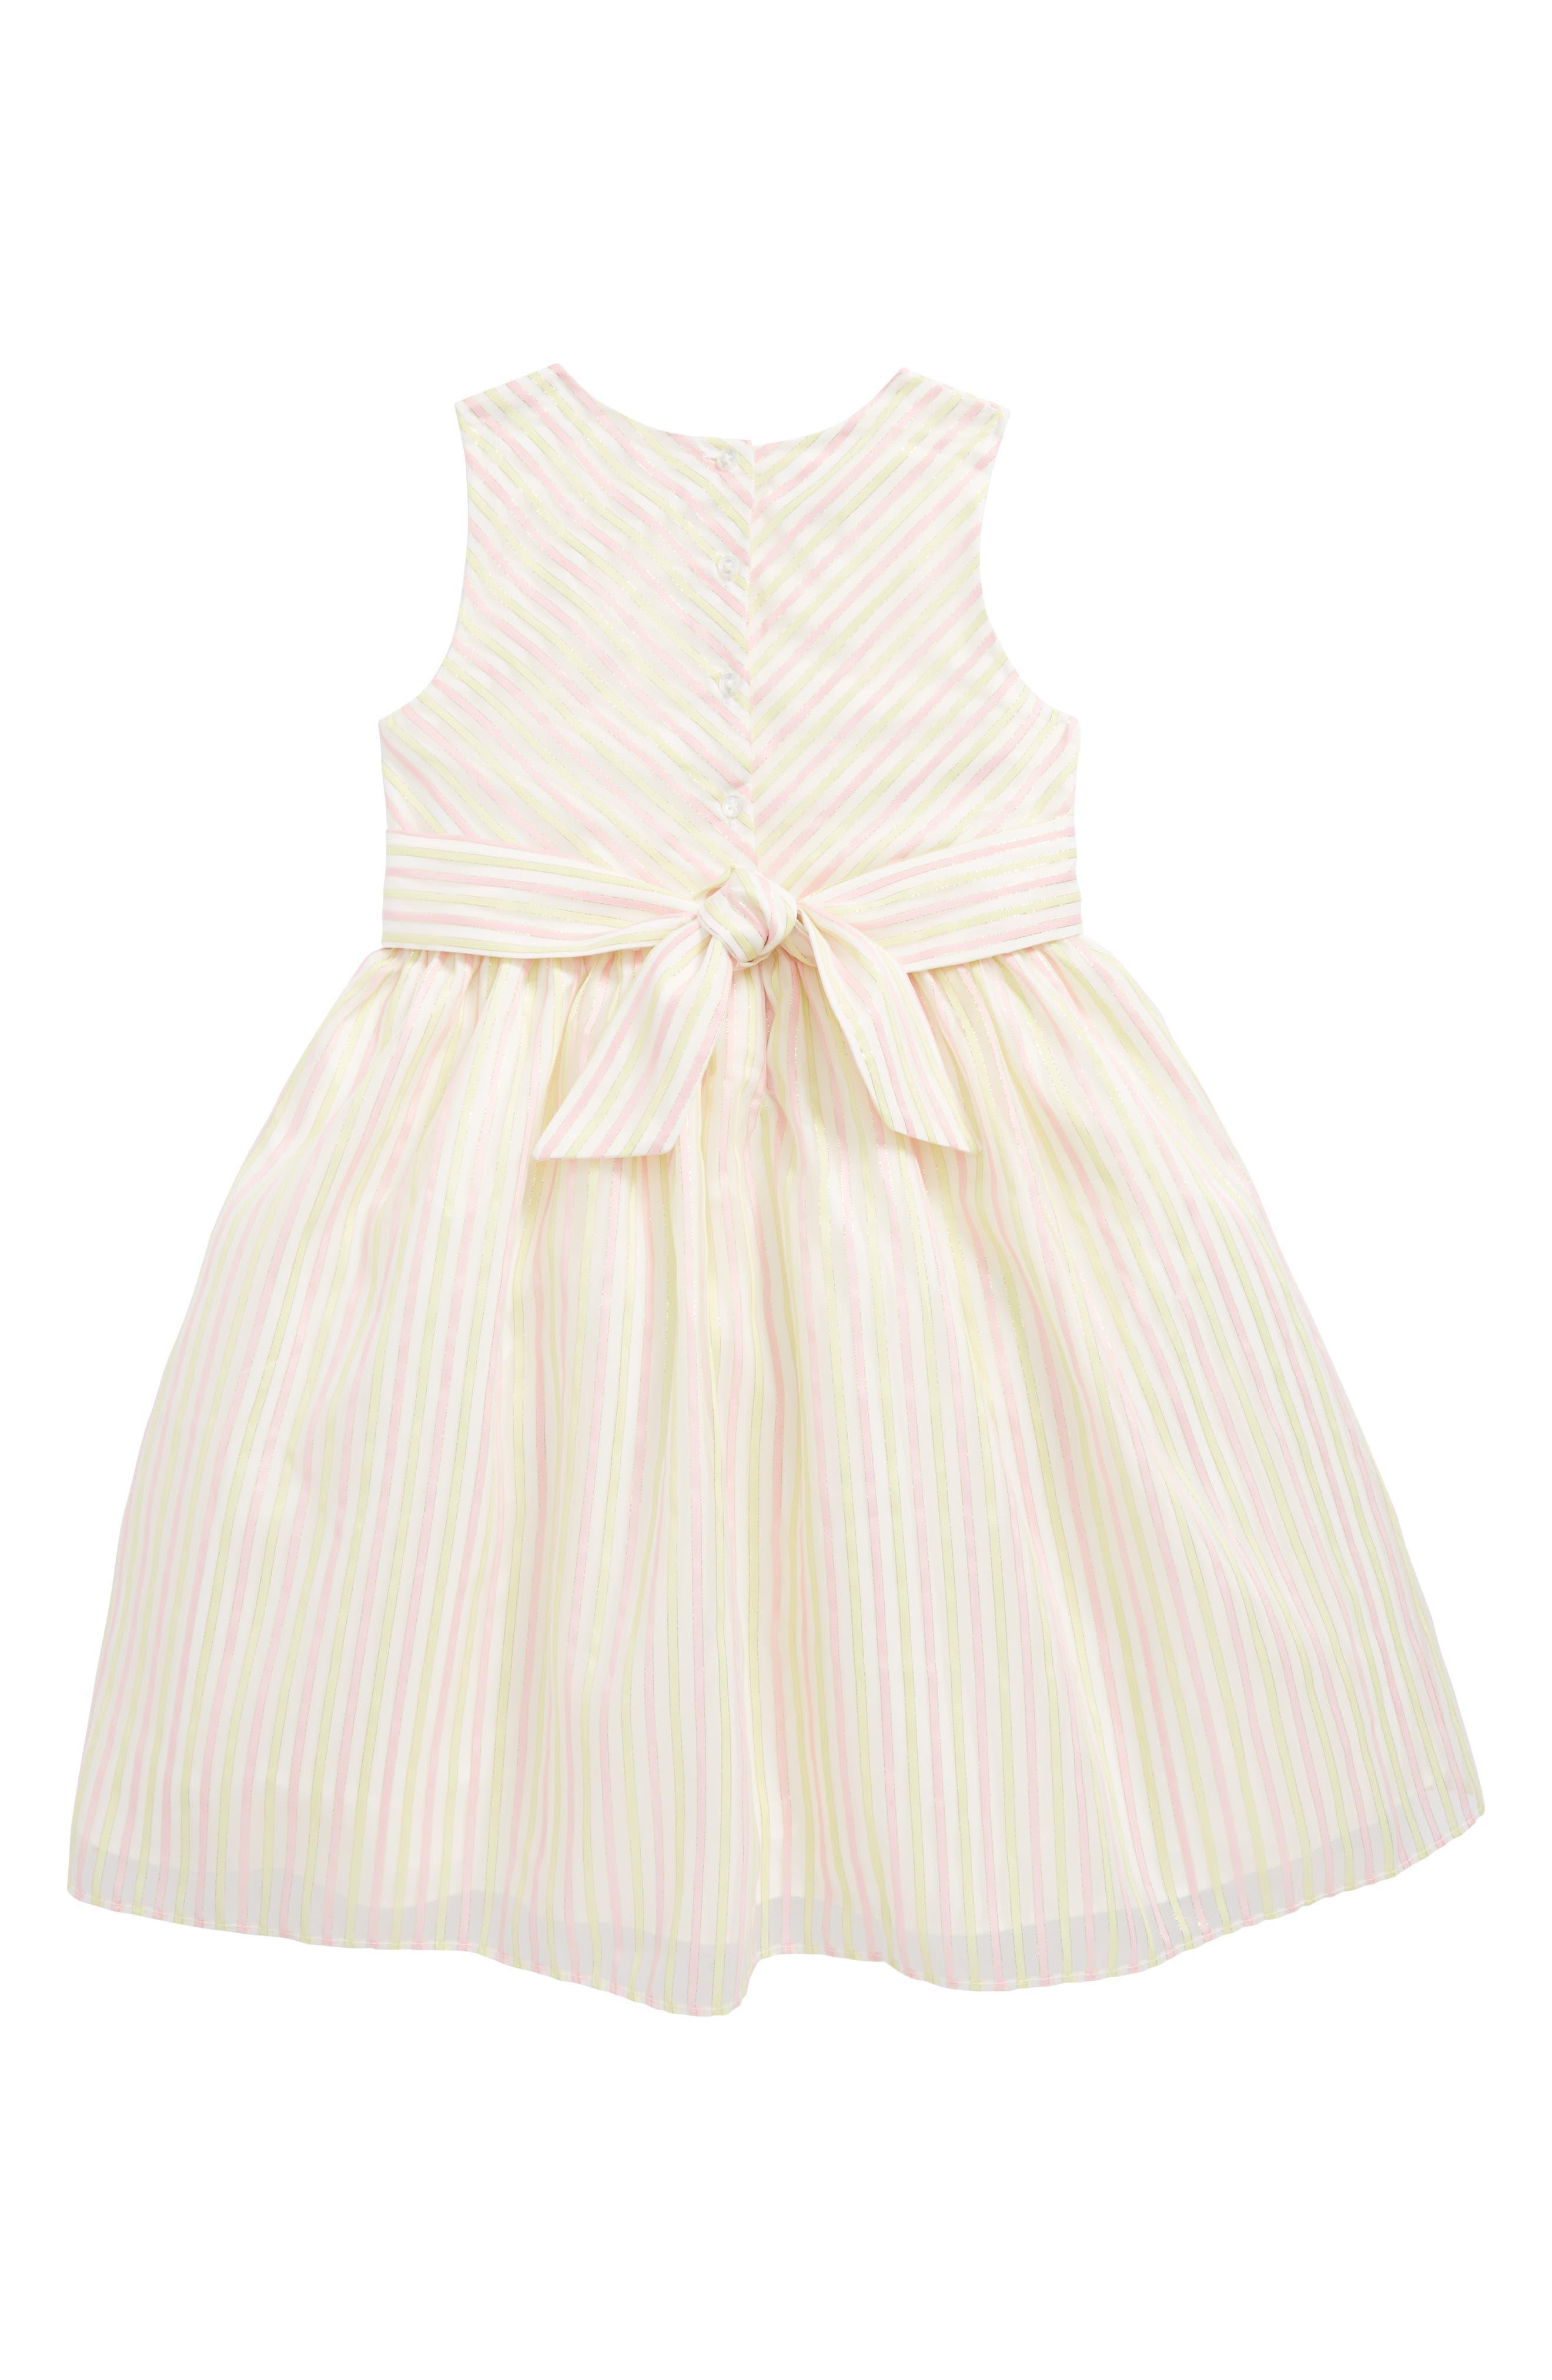 Metallic Stripe Dress,                             Alternate thumbnail 2, color,                             Pink Yellow